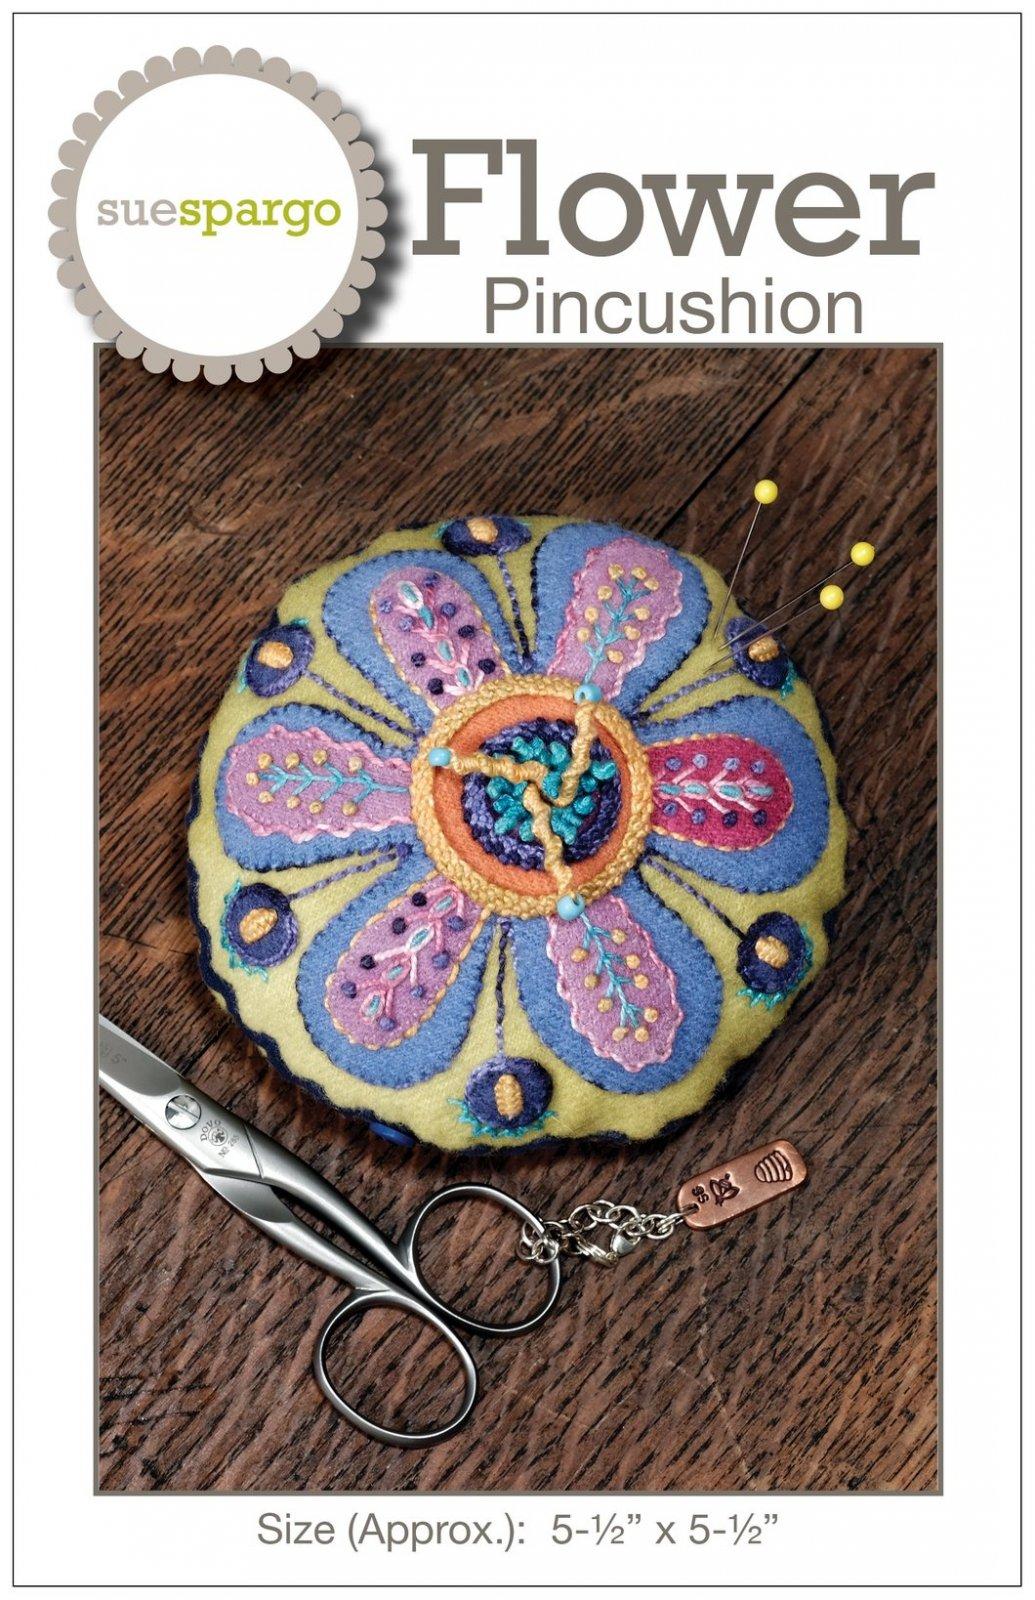 Flower Pincushion Classroom Series Kit